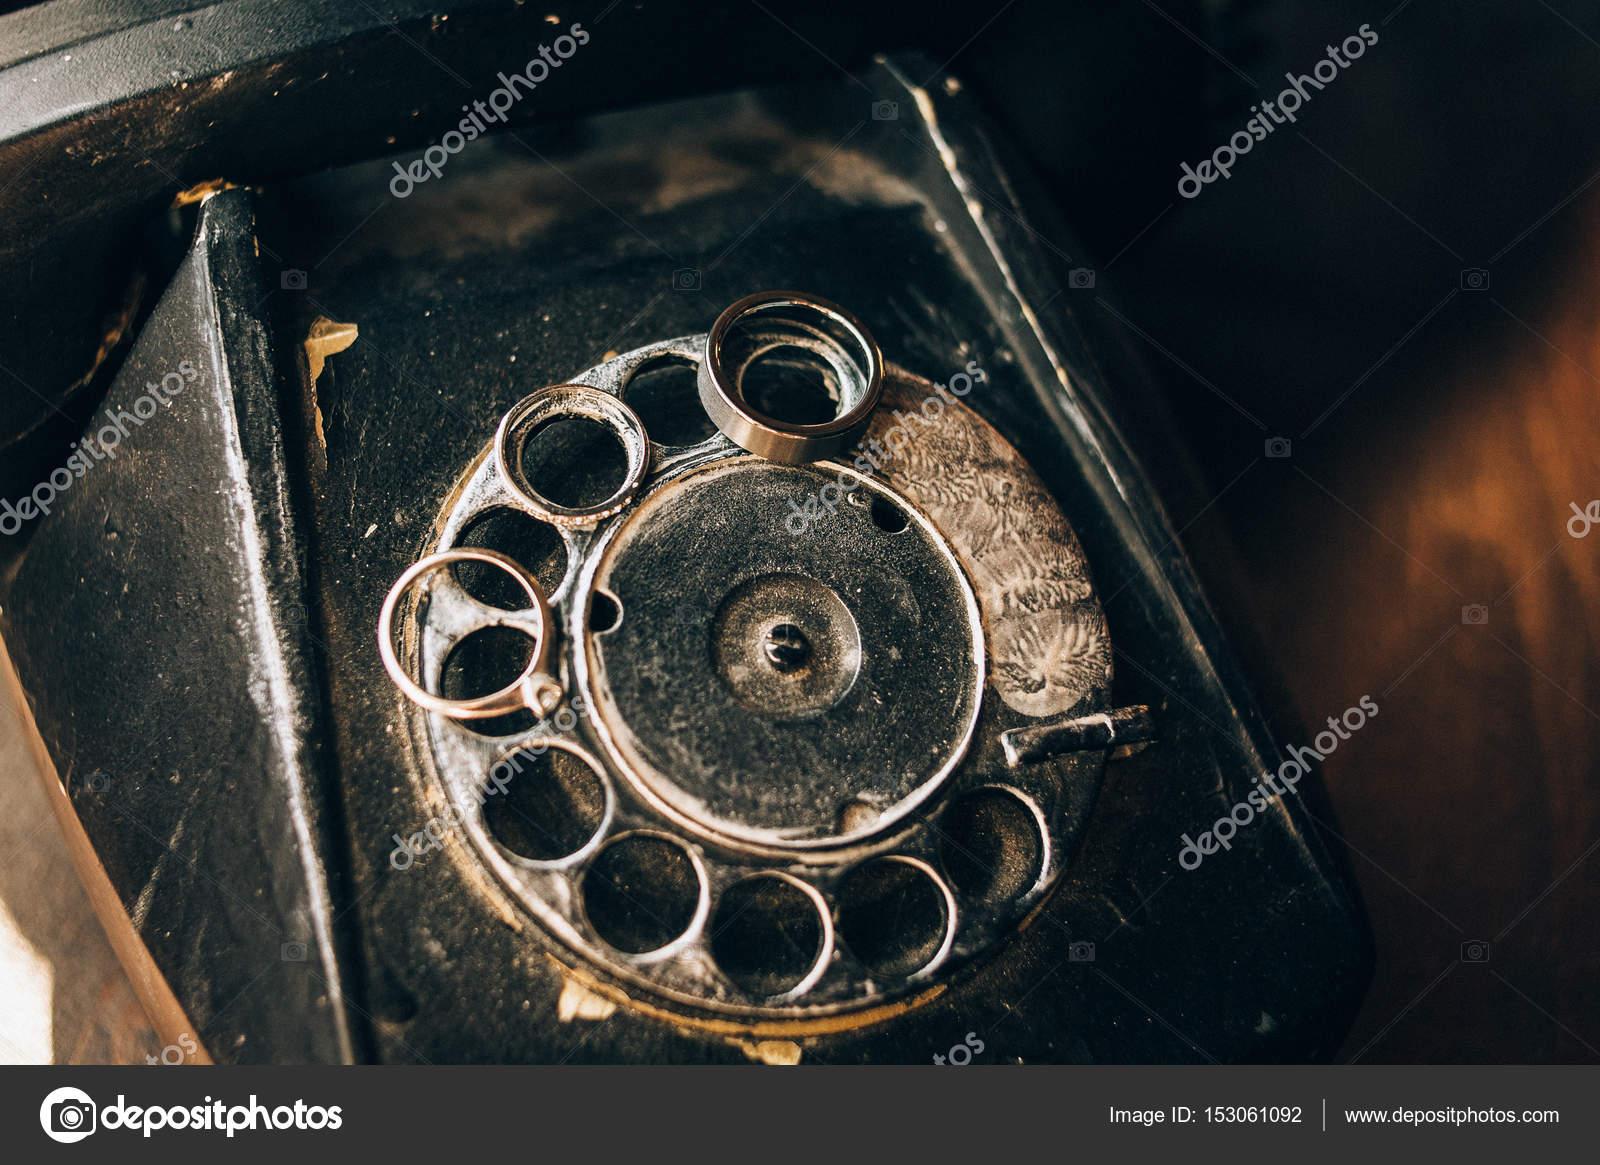 Snubni Prsteny Vintage Telefonu Stock Fotografie C Andrey Gribov